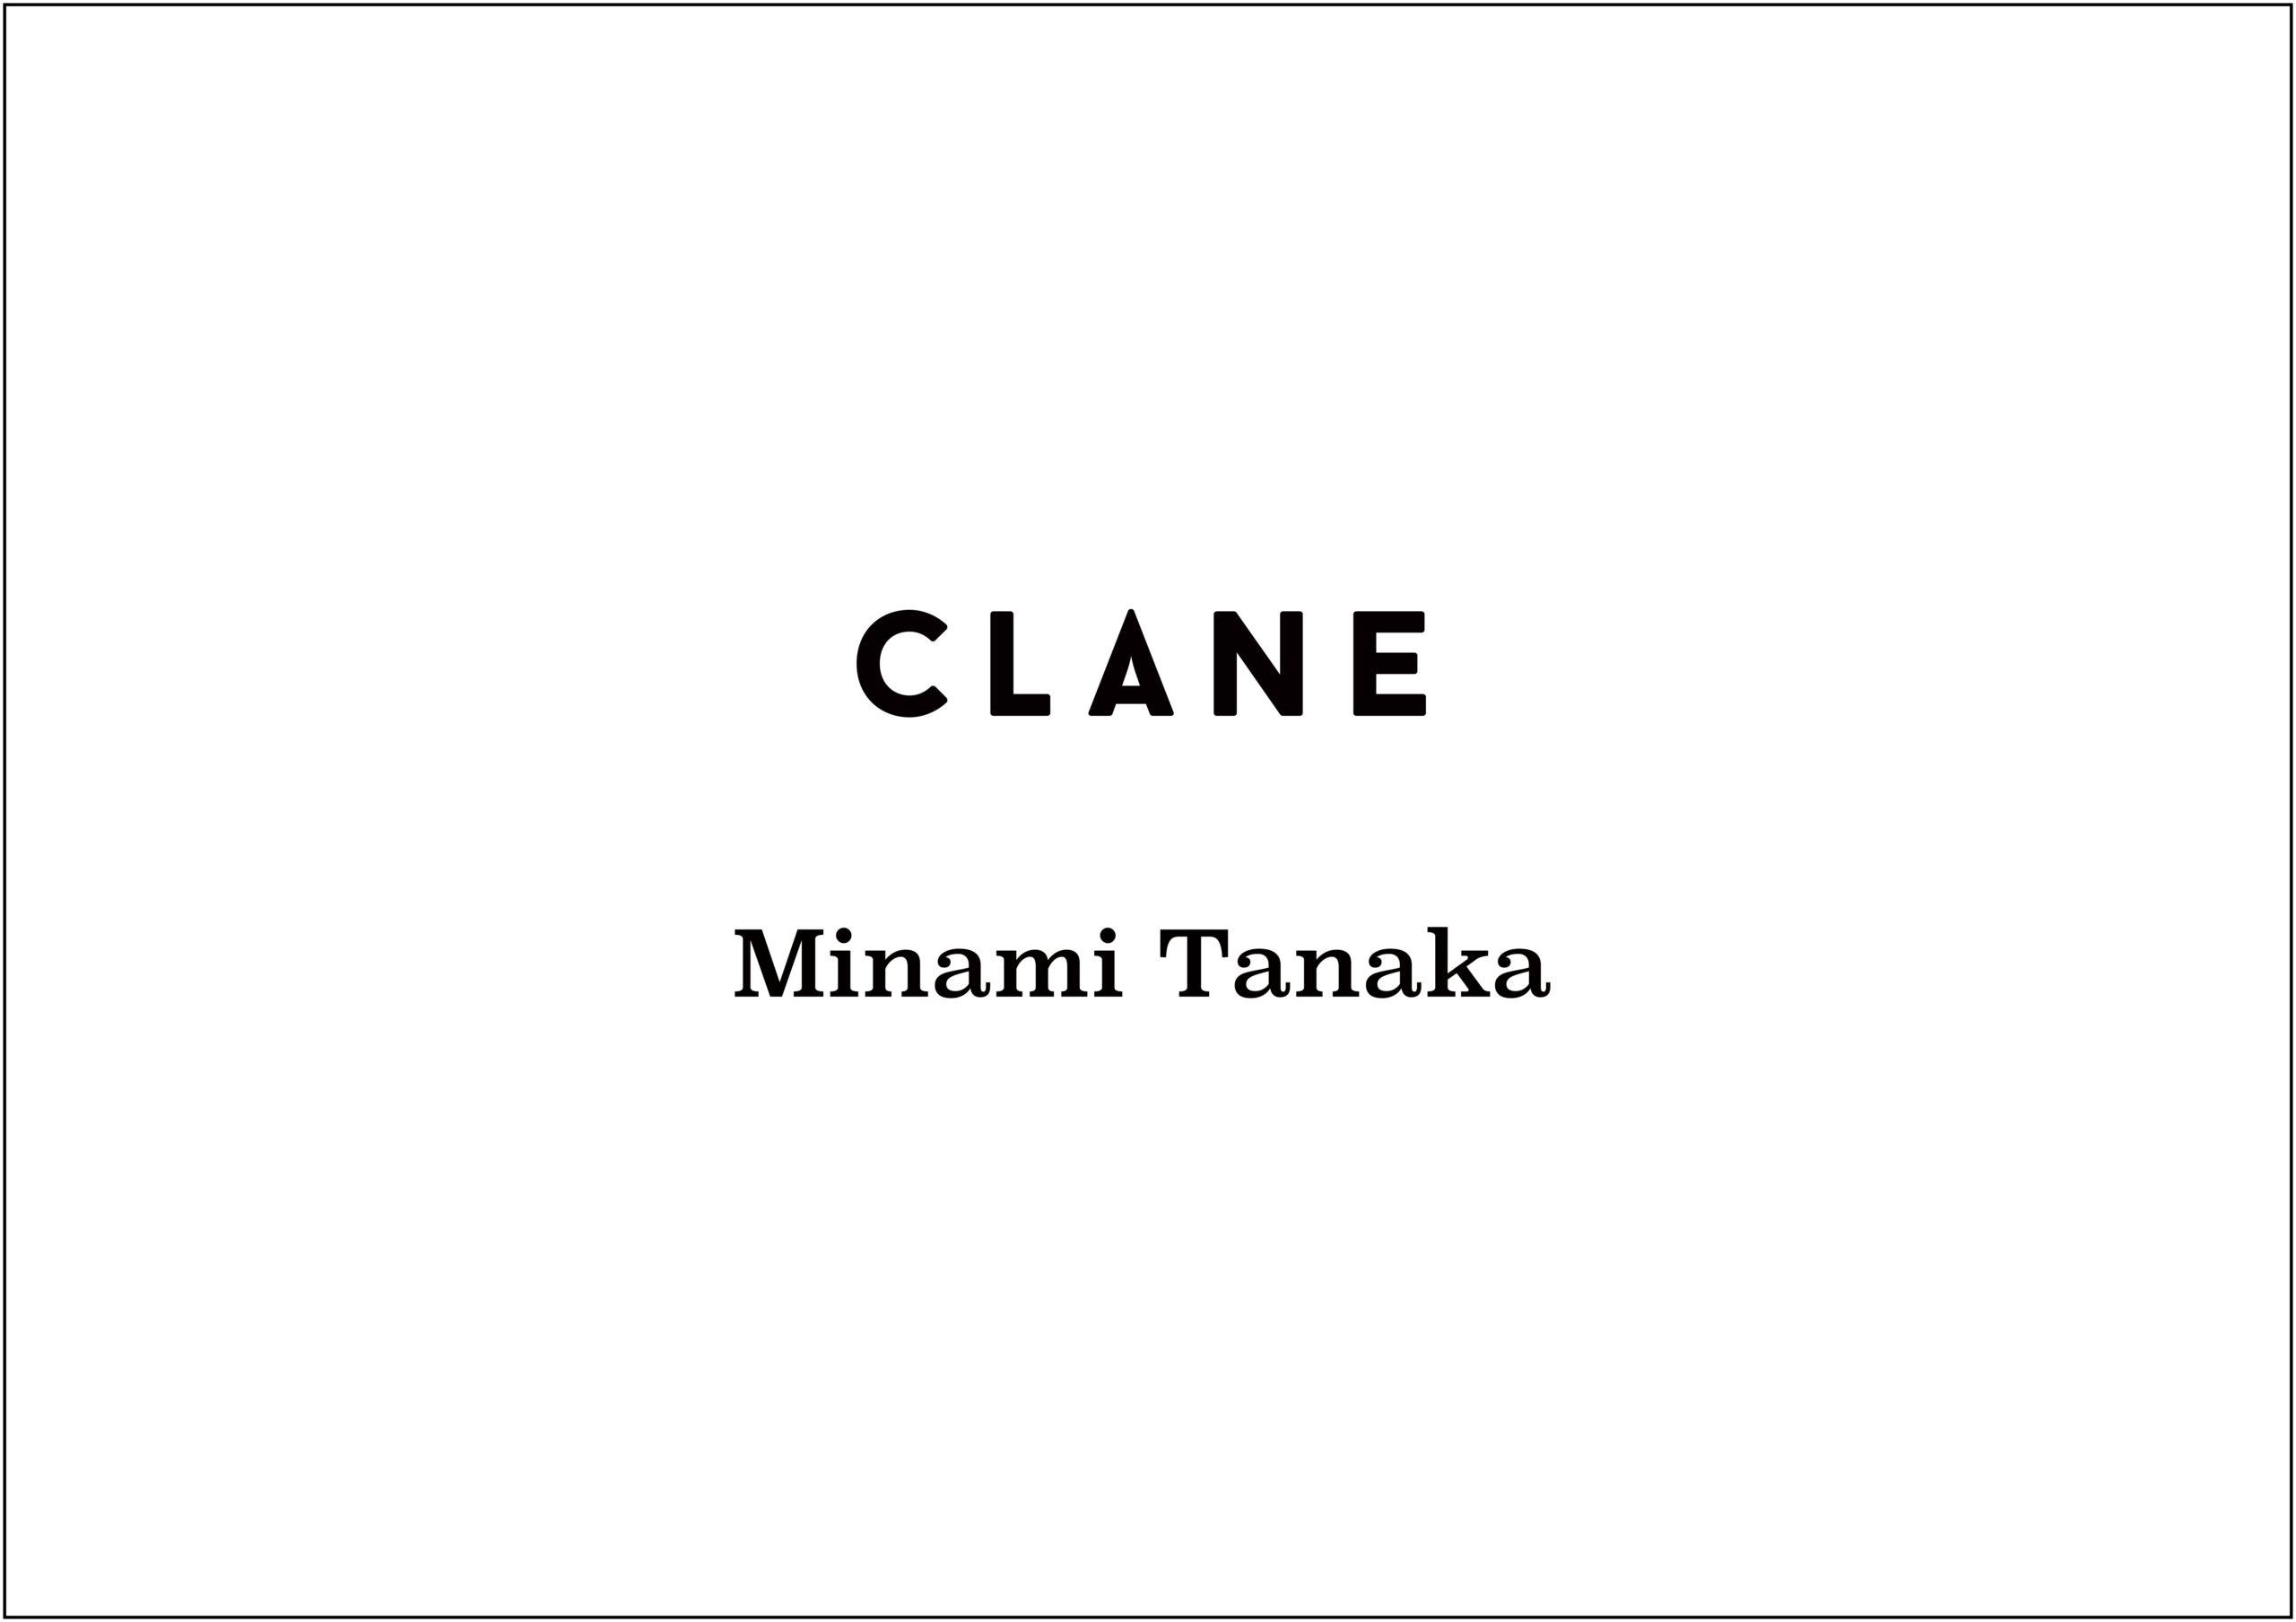 「CLANE(クラネ)」×「Minami Tanaka(田中みな実)」